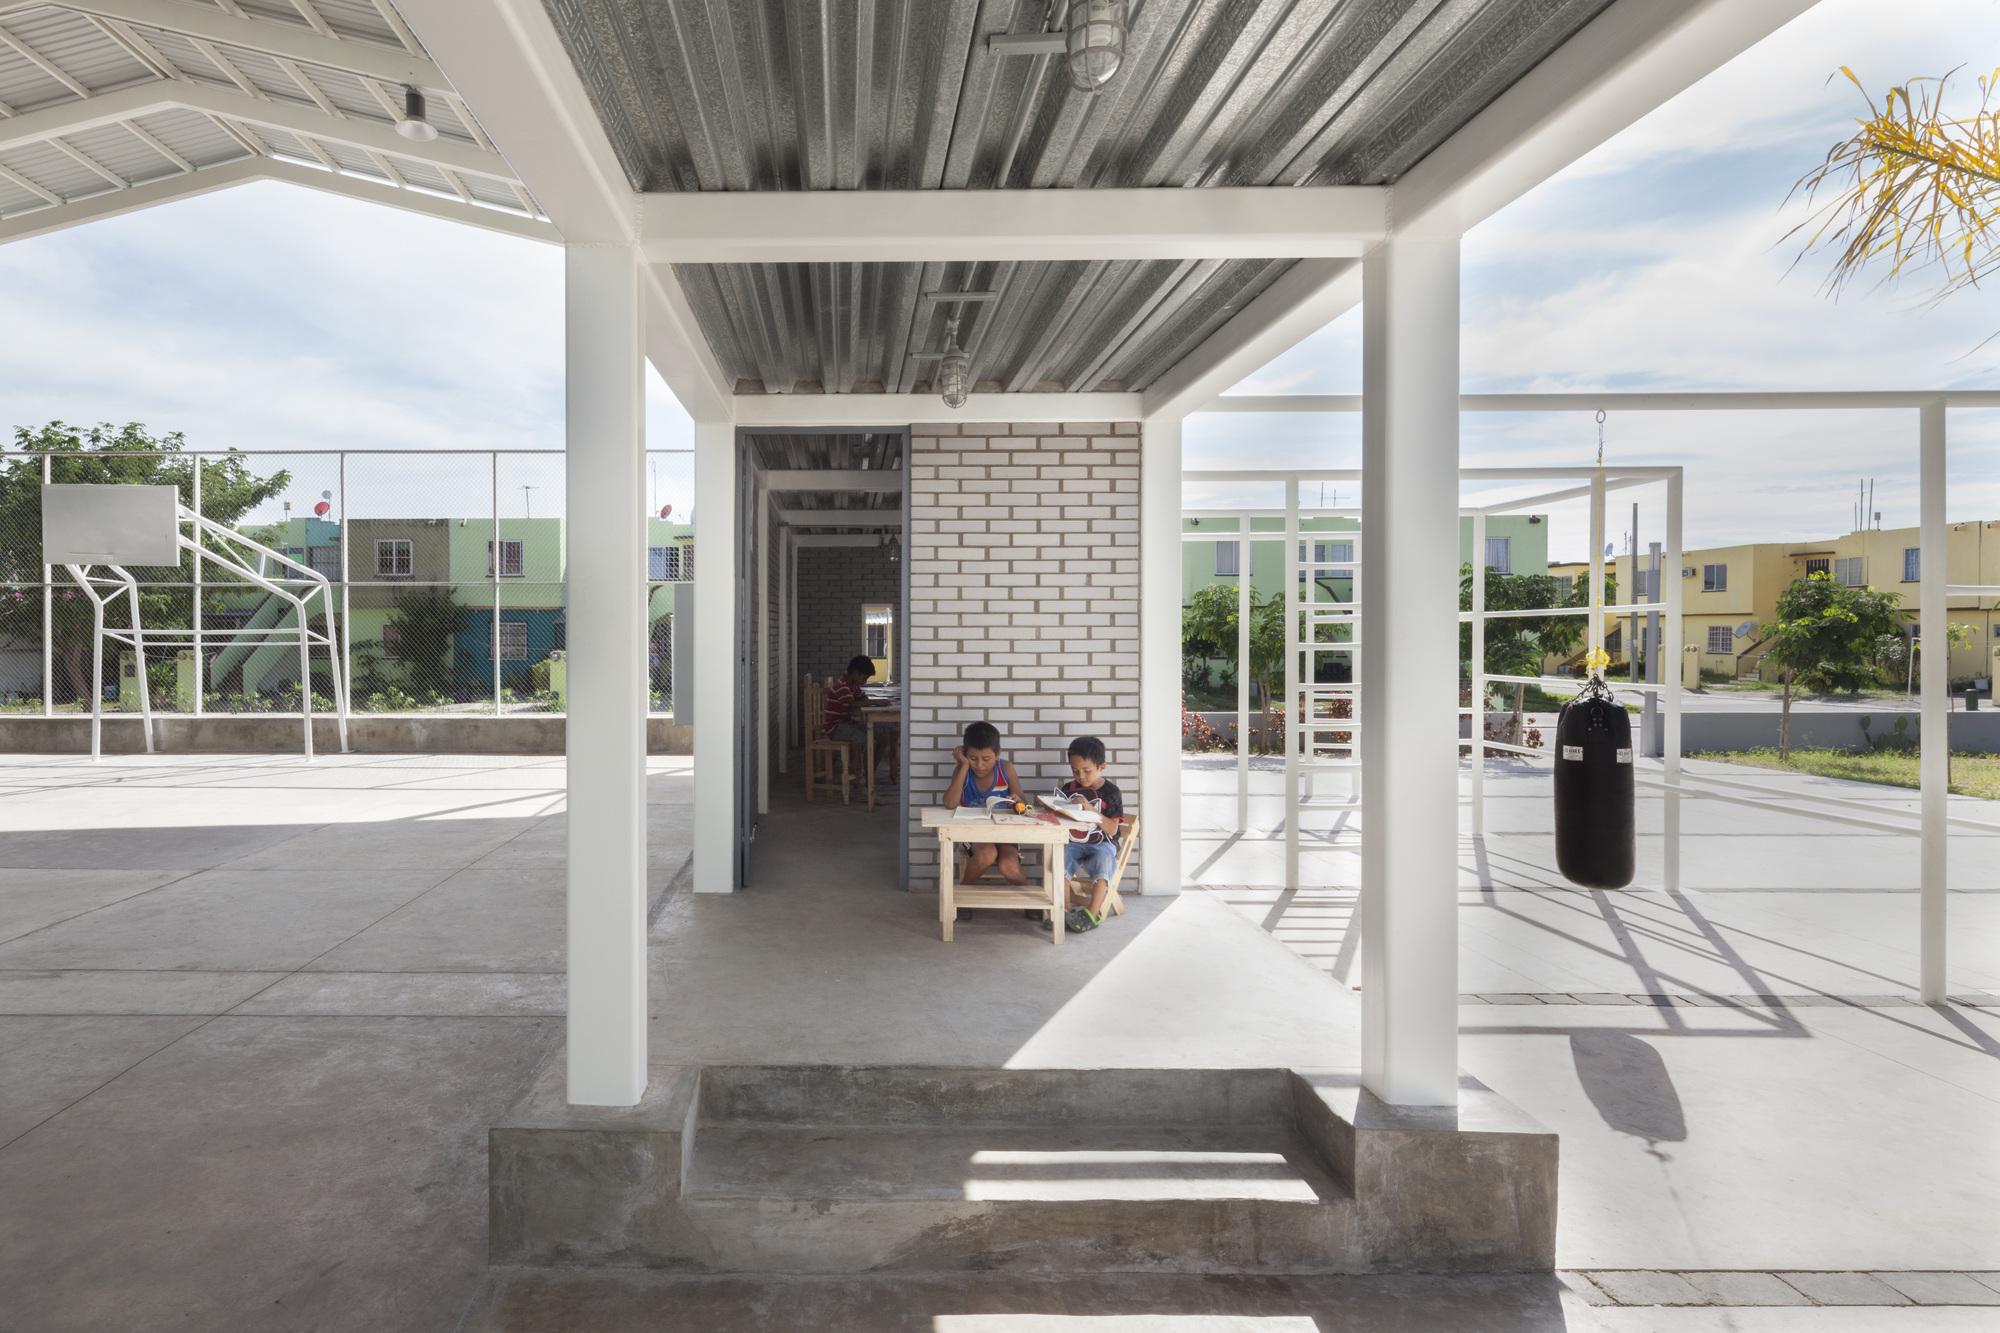 Galer a de cancha rozana montiel estudio de for Arq estudio de arquitectura